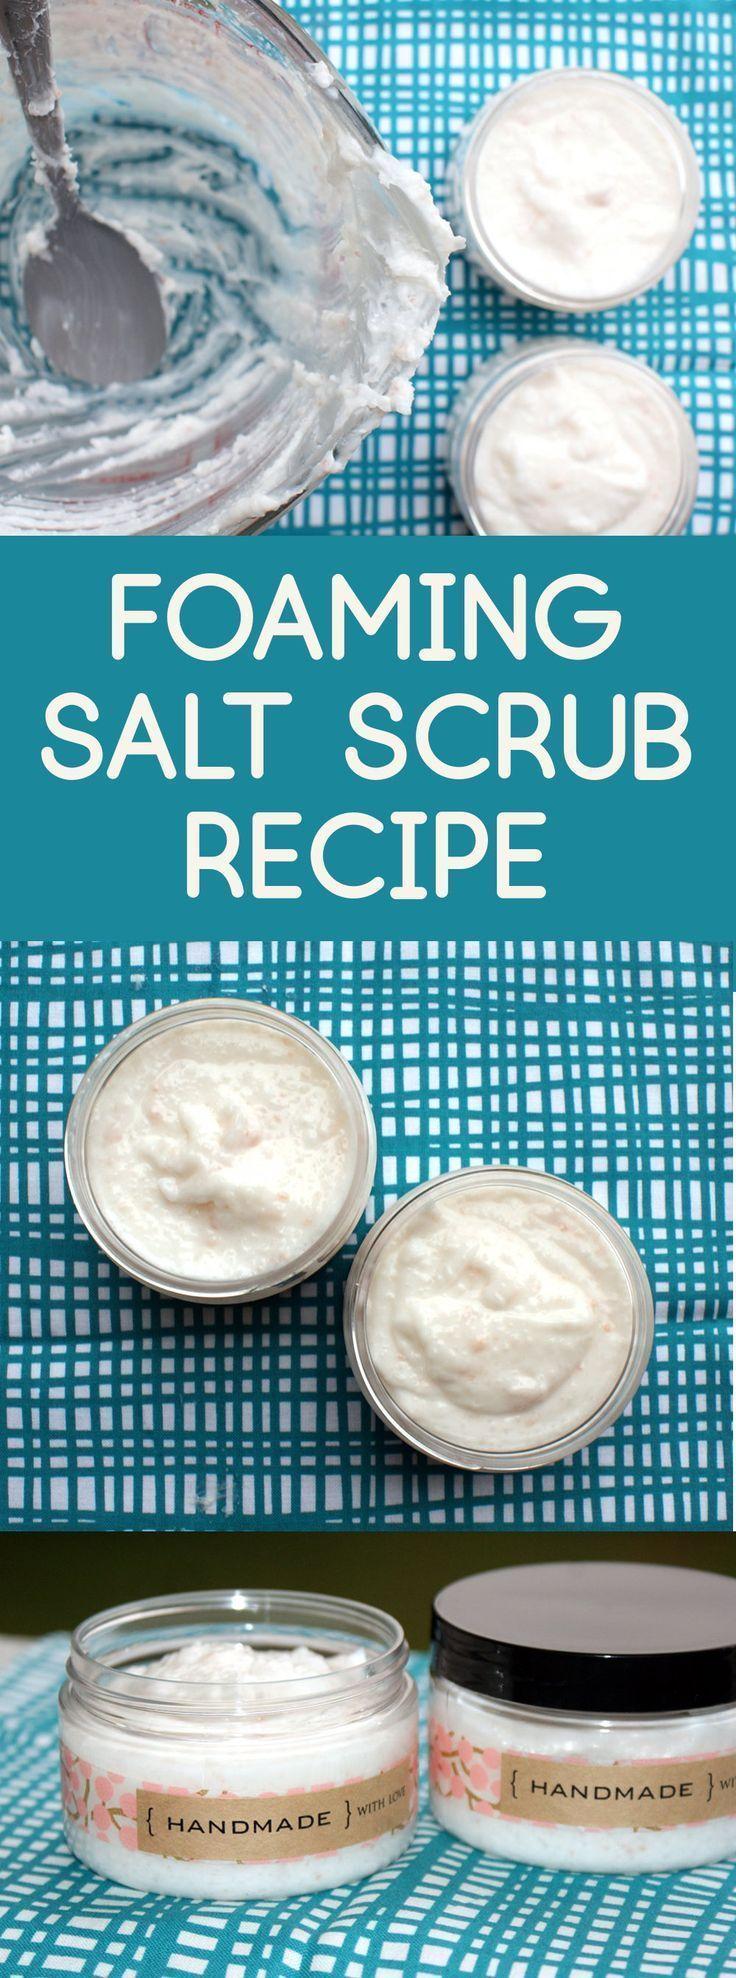 DIY Foaming Salt Scrub: A 3-in-1 Skin Care Product & Gift Idea! This DIY foaming…